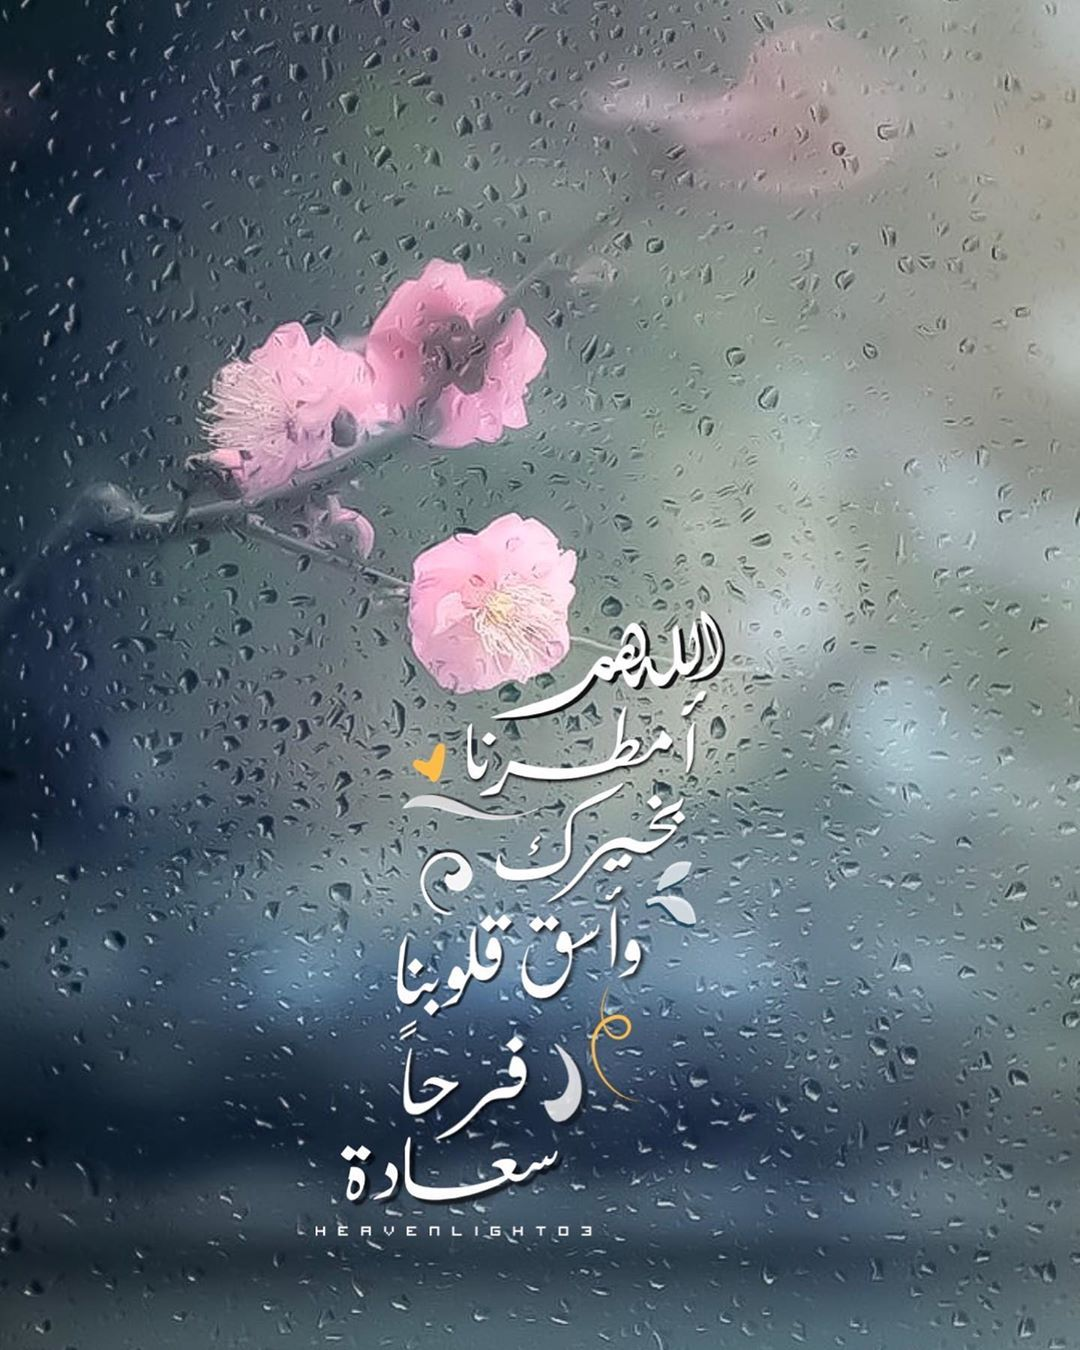 Muna On Instagram اللهم أمطرنا بخيرك و اسق قلوبنا فرحا وسعادة Good Morning Images Flowers Sky Photography Nature Islamic Pictures